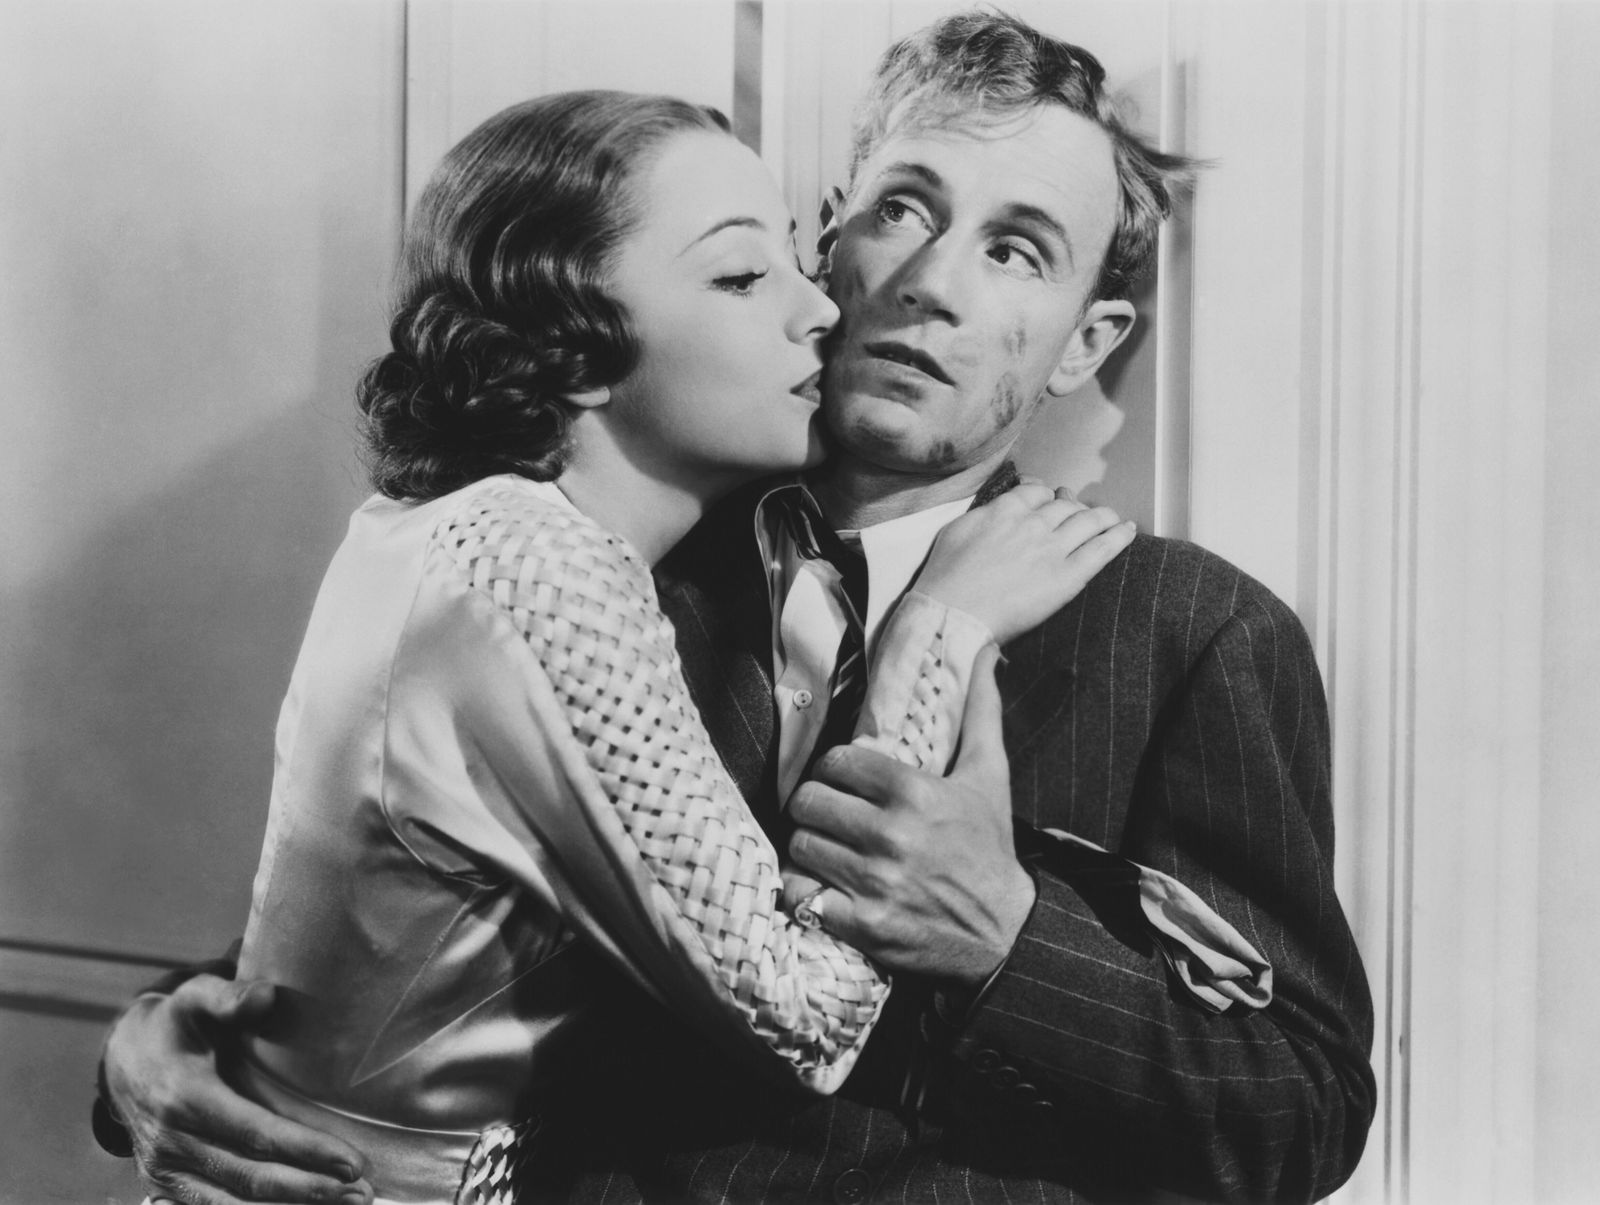 IT'S LOVE I'M AFTER, Olivia De Havilland, Leslie Howard, 1937